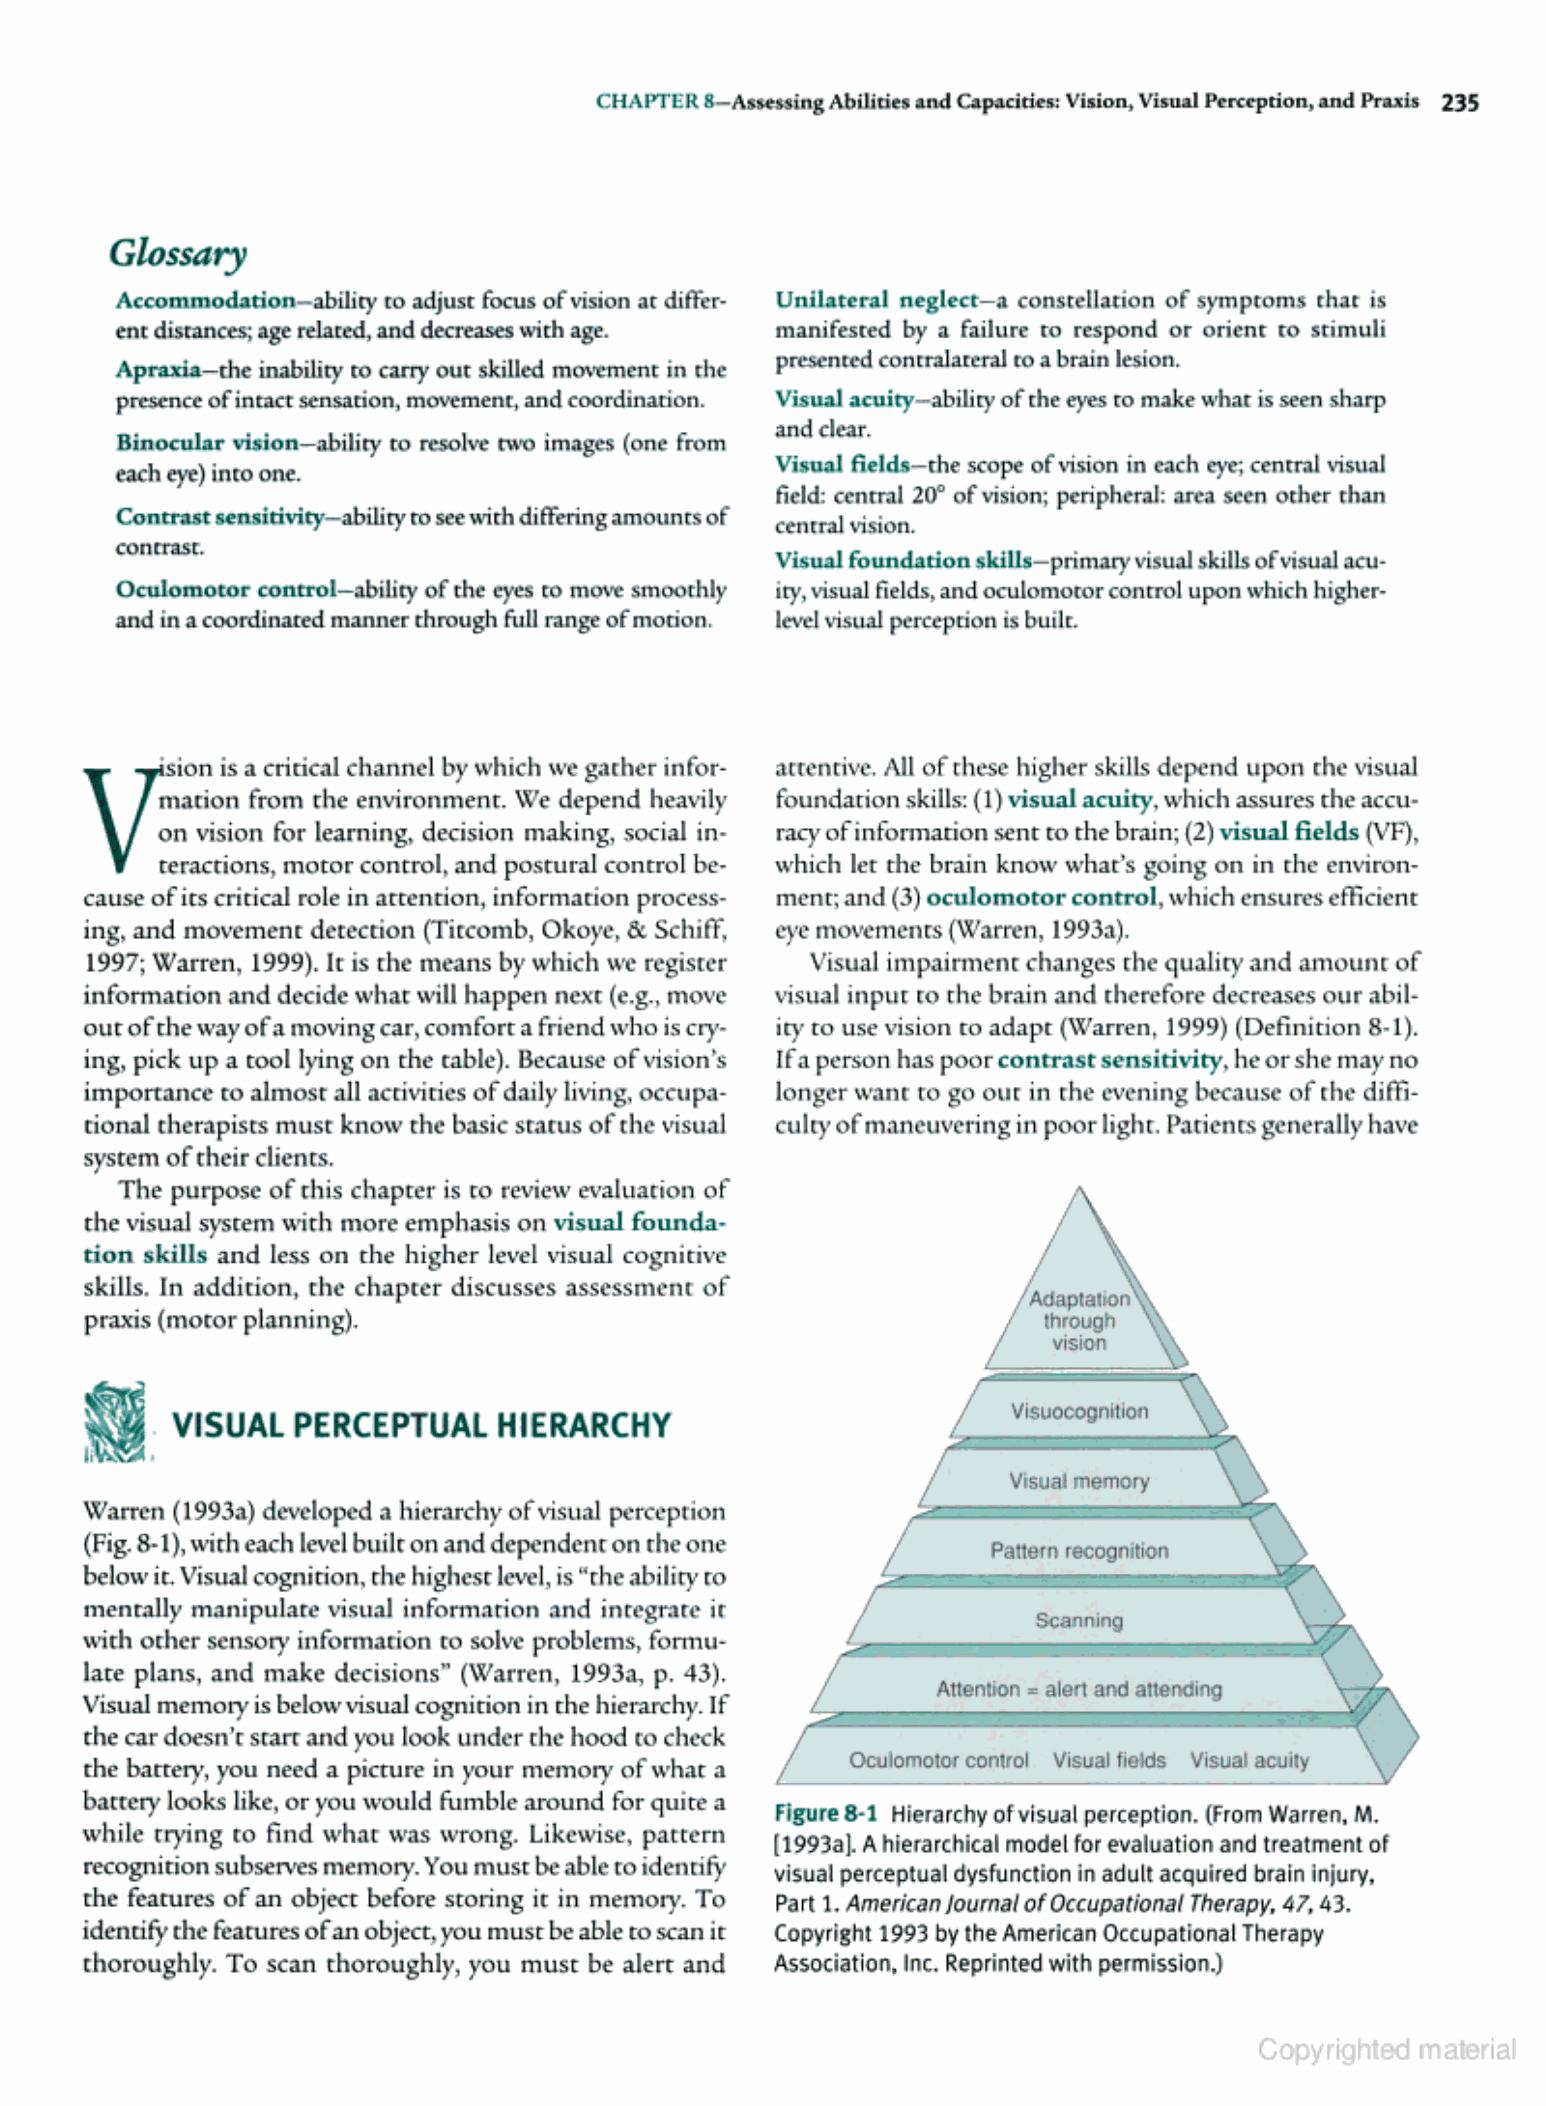 Hierarchy Of Visual Perceptual Skills Need Oculomotor